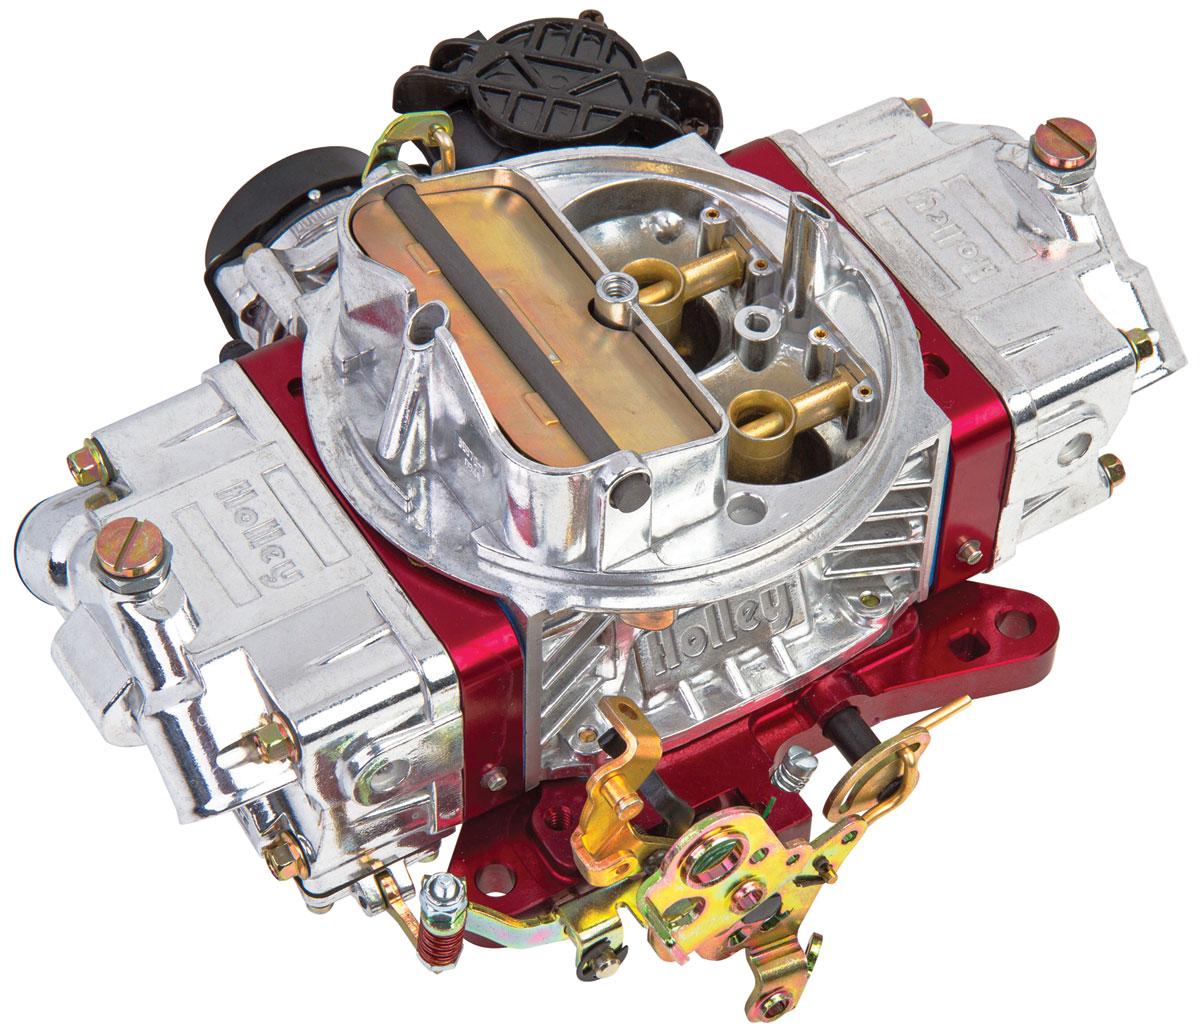 Photo of Carburetors, Holley, Ultra Street Avenger 870 Cfm red metering blocks